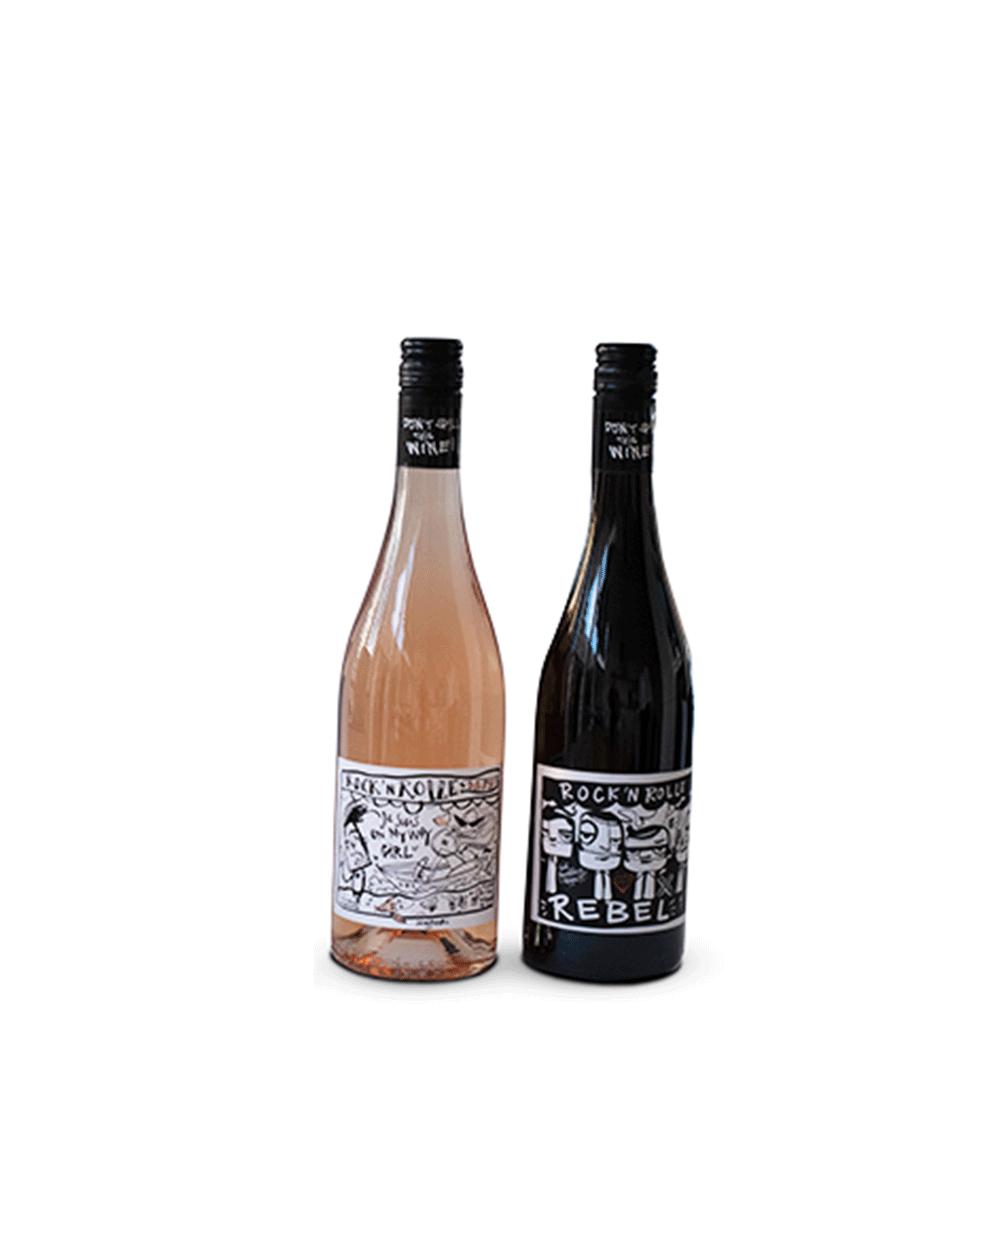 Couples-retreat-wijn-box-2-lottelust